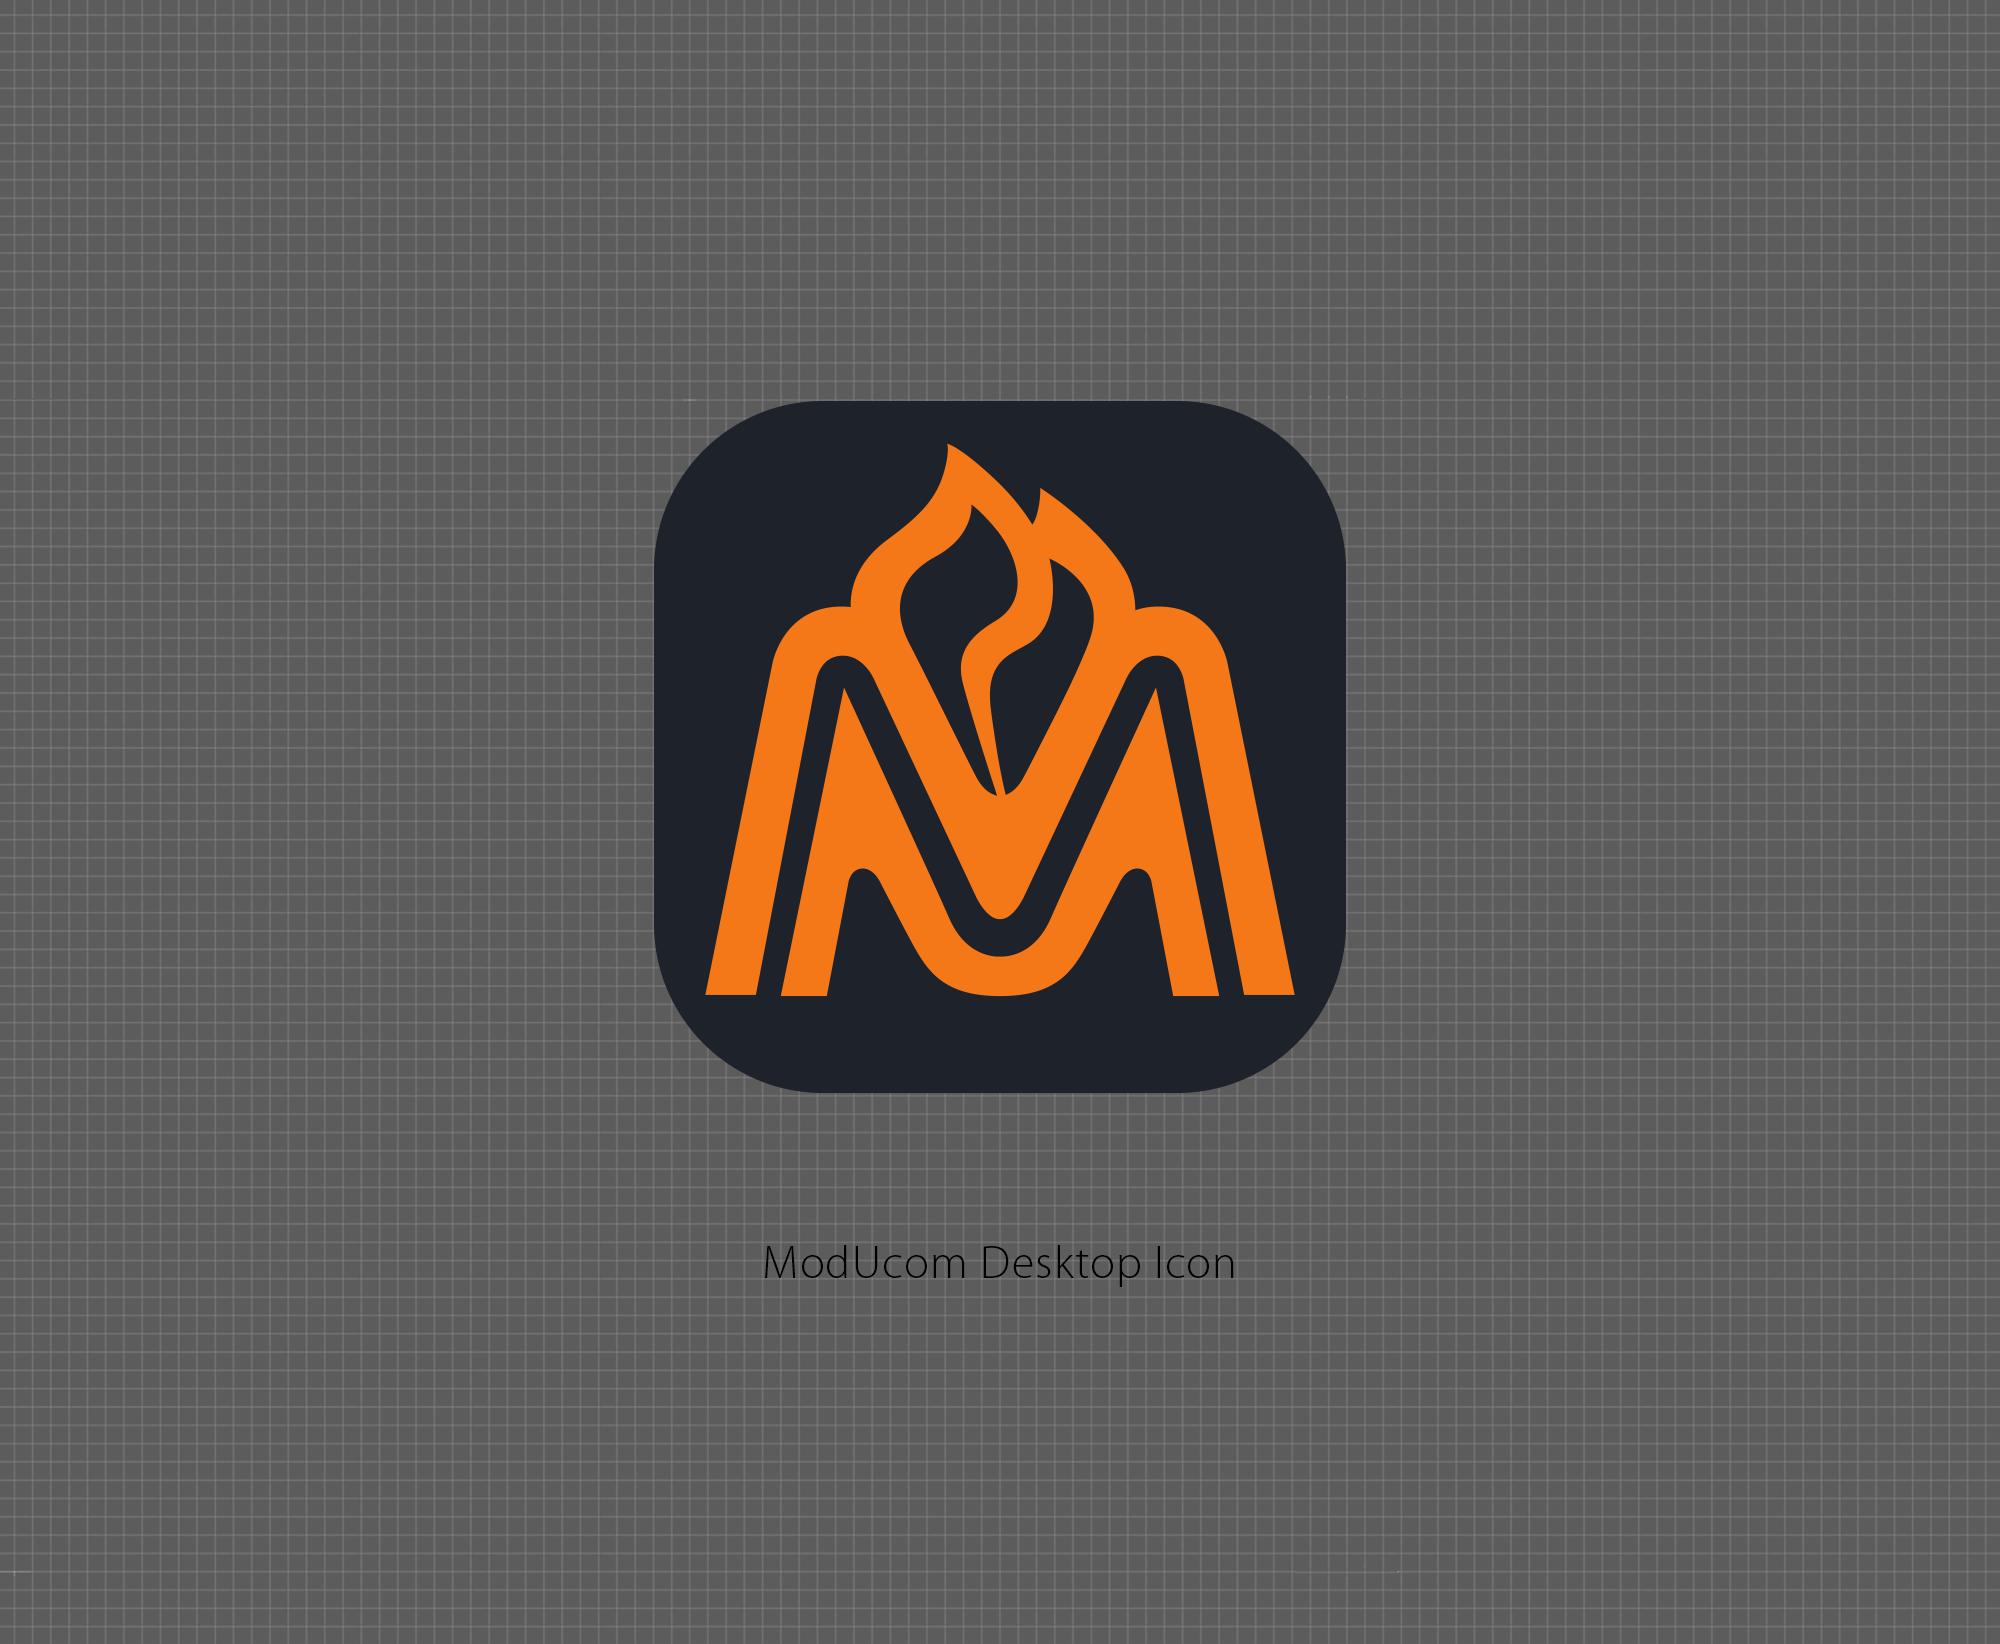 ModUcom Desktop Icon